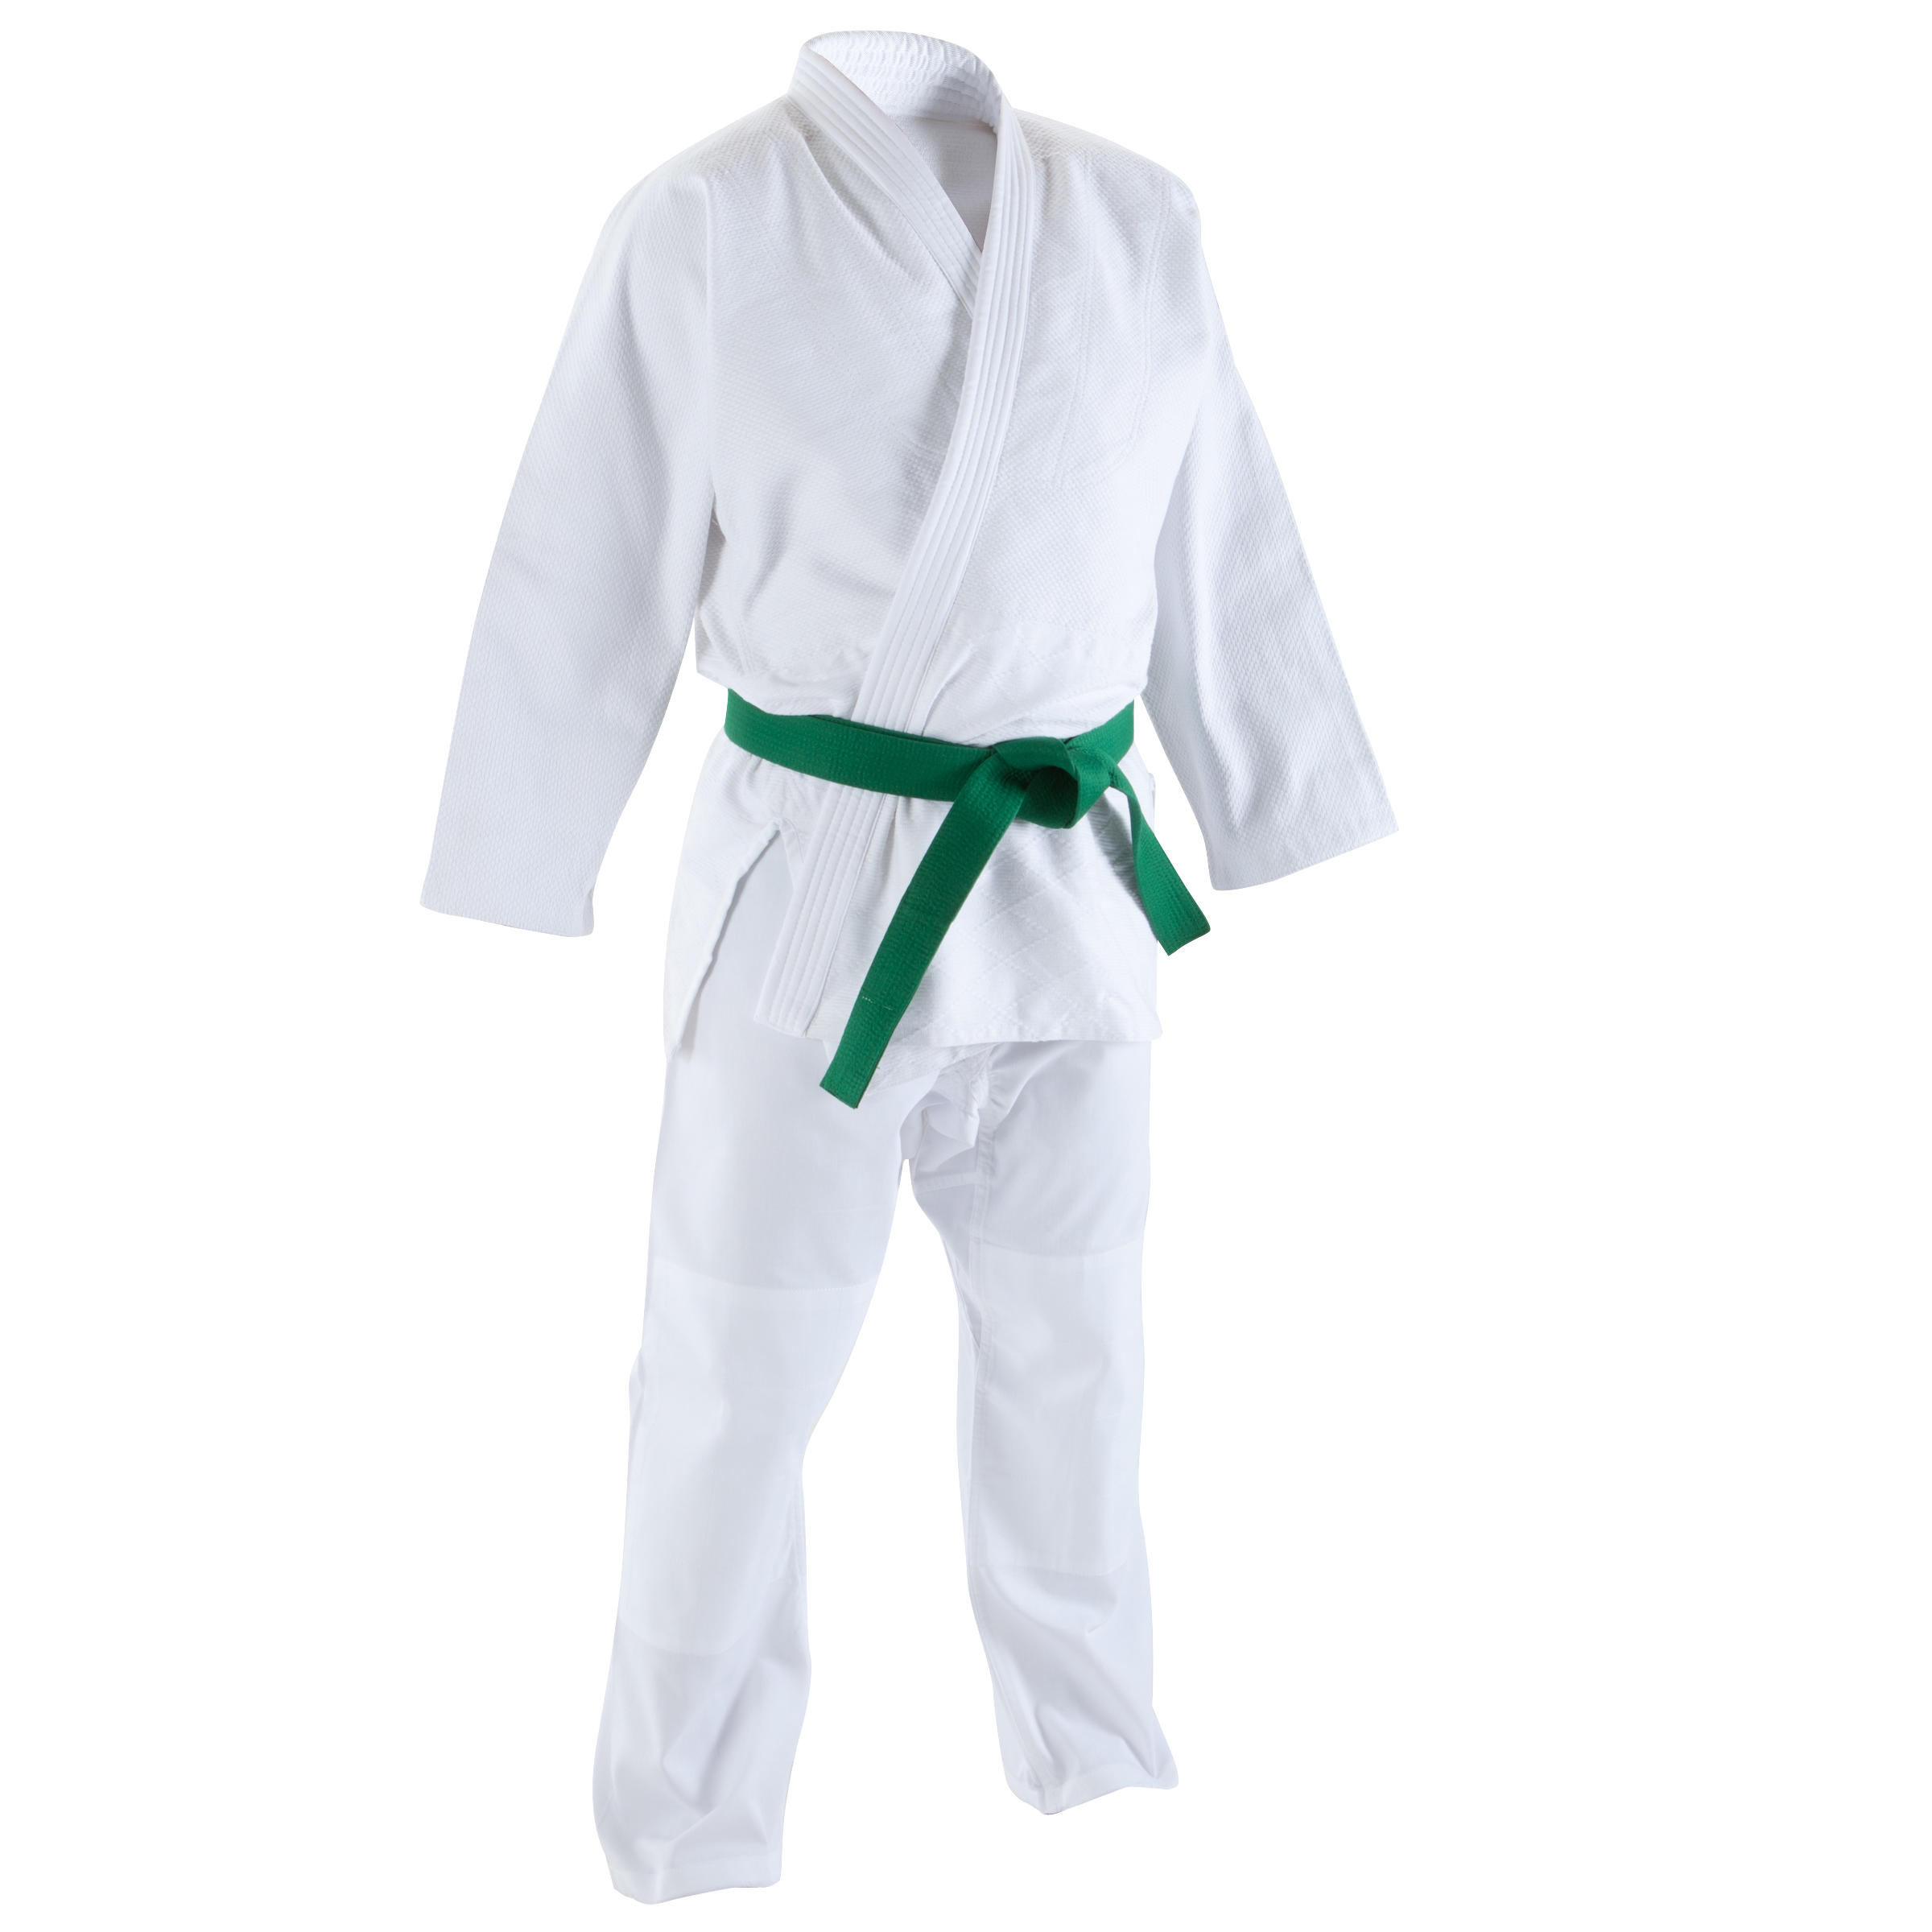 Outshock Judopak 440 volwassenen